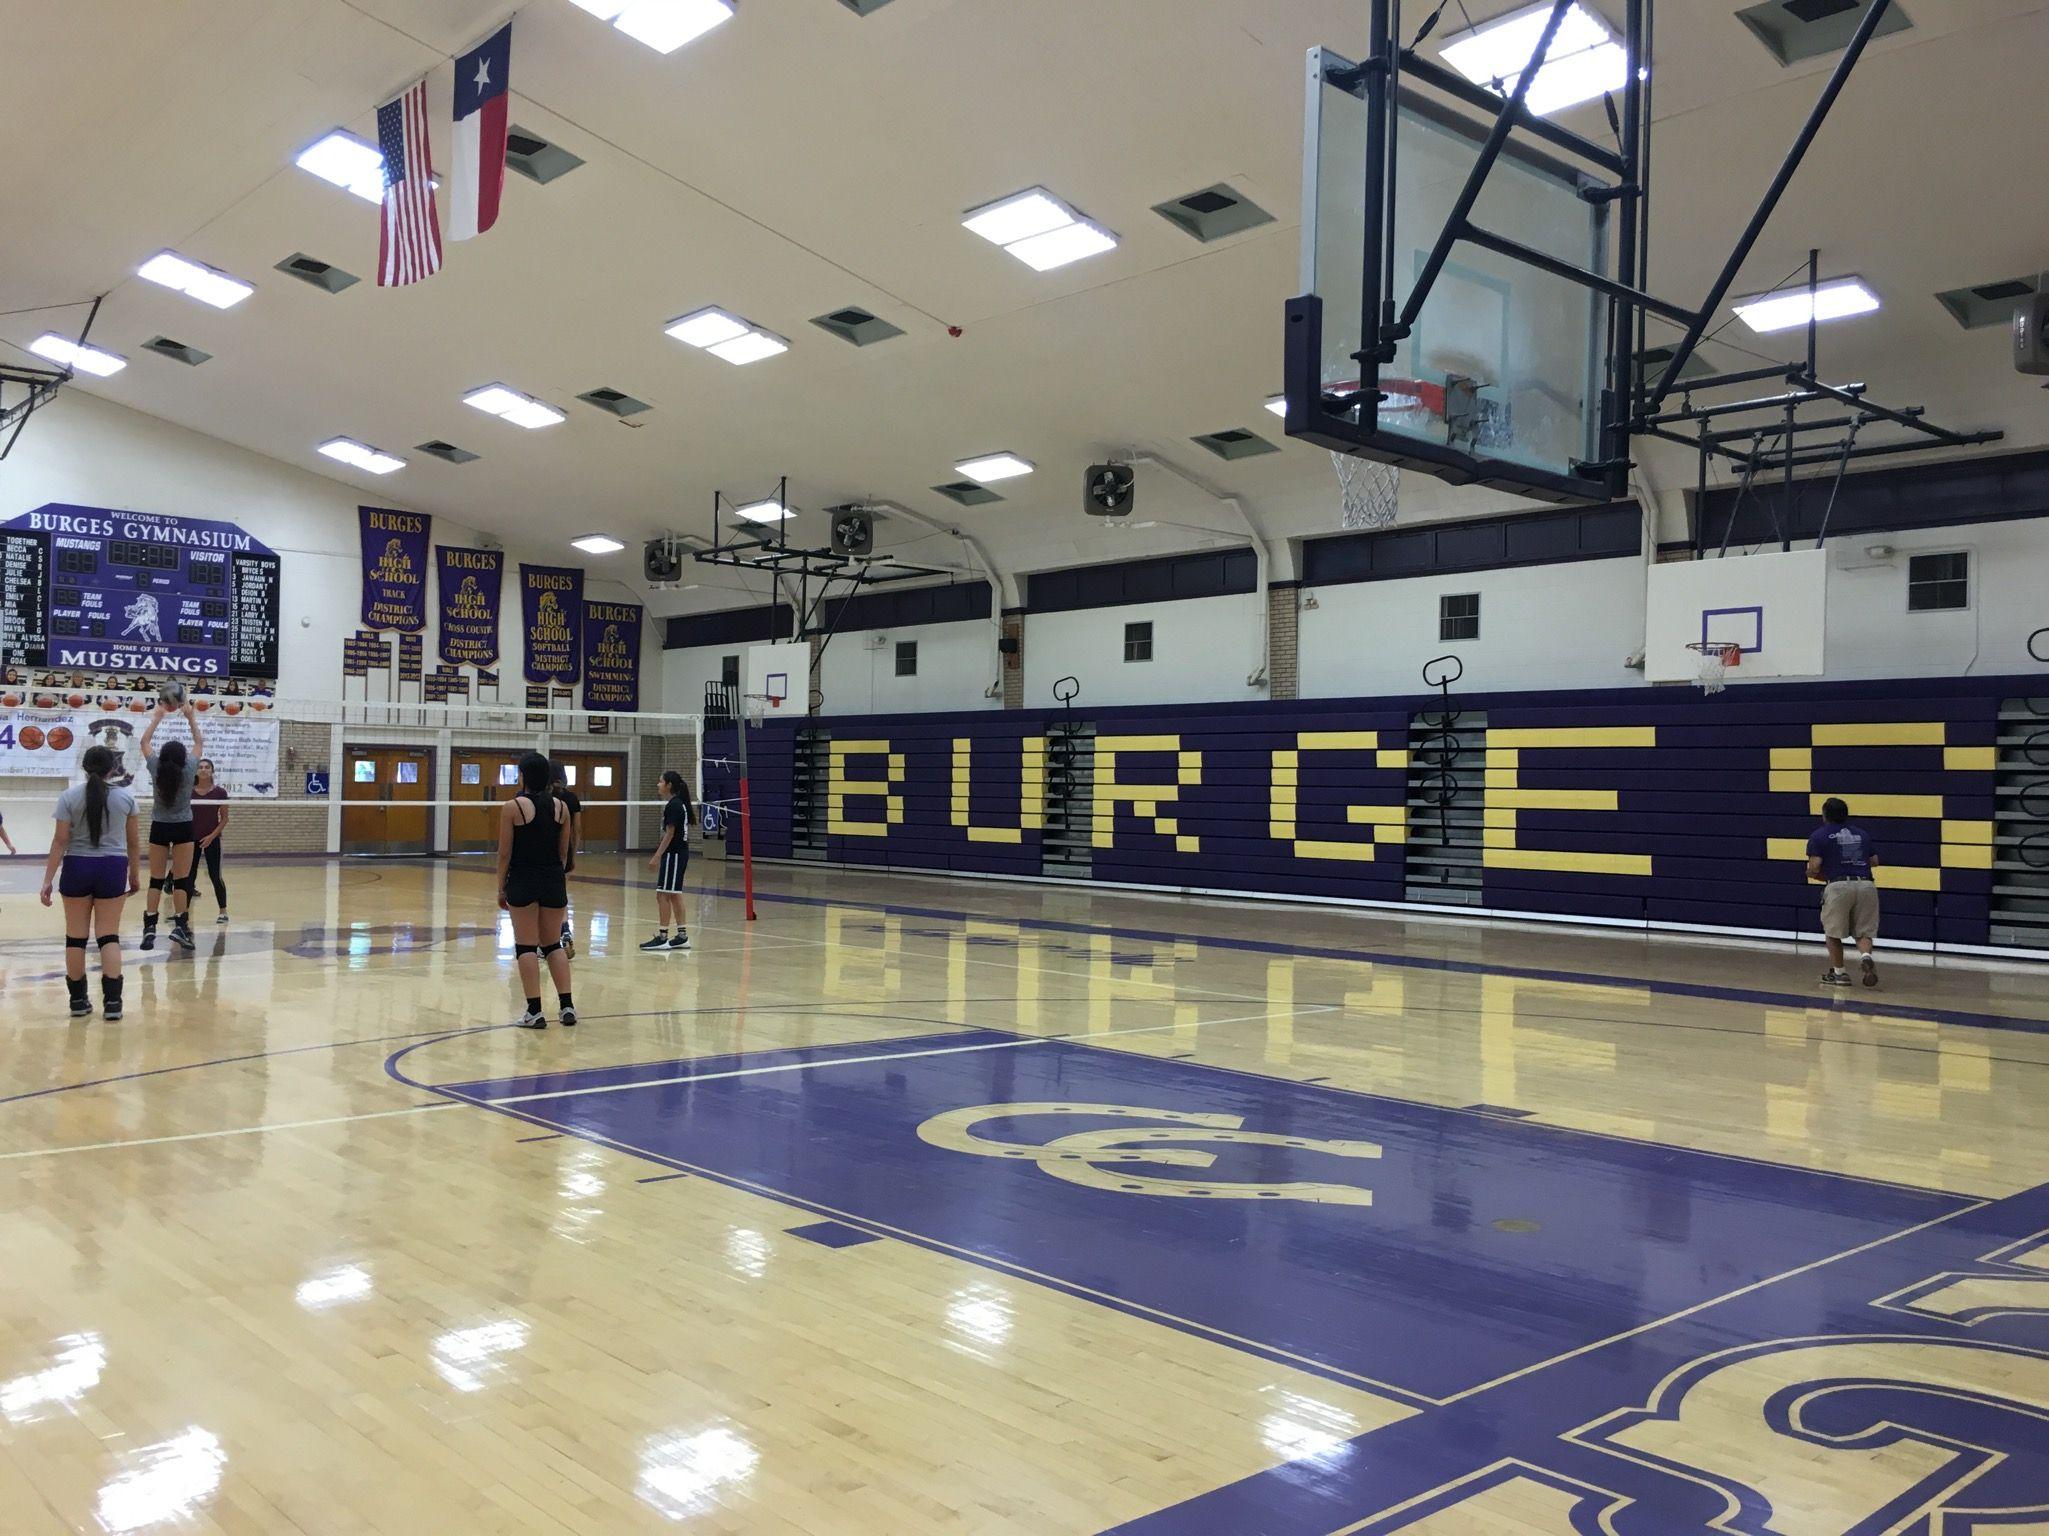 Burges Gymnasium Volleyball Outdoor Volleyball Net Volleyball Volleyball Net